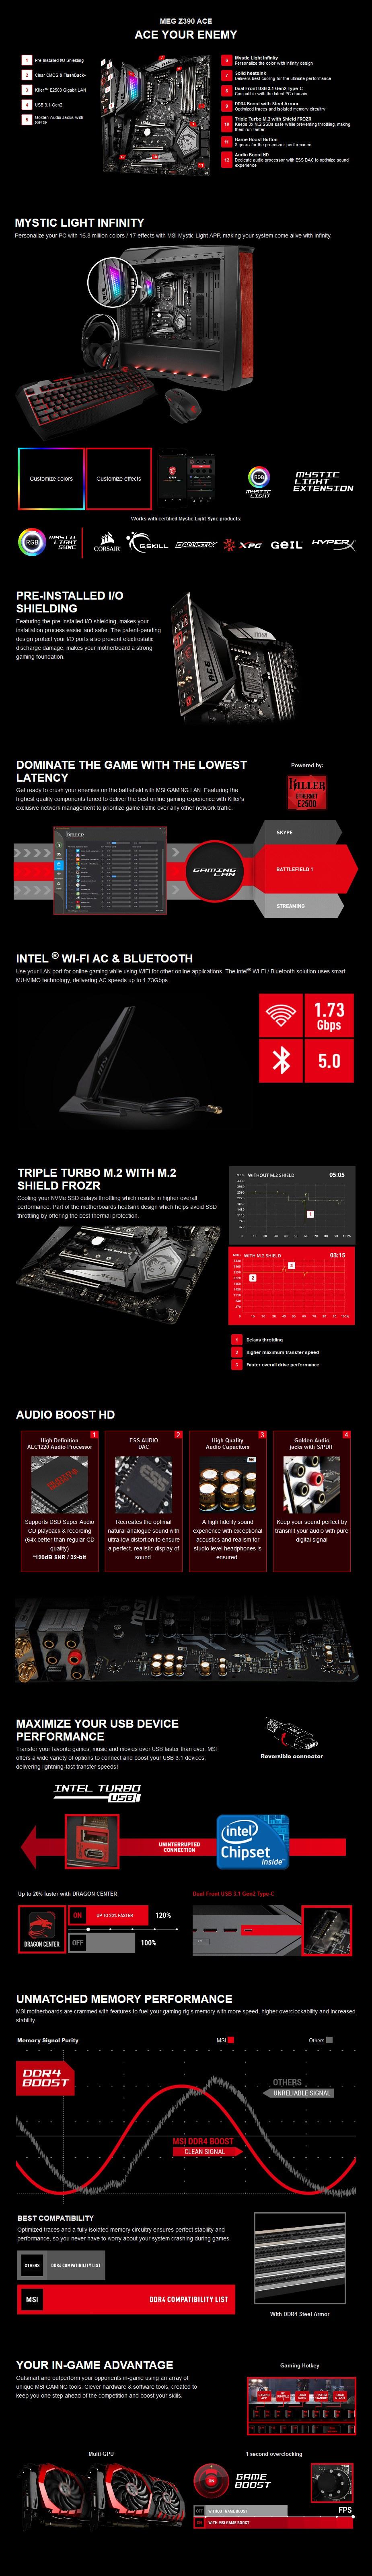 MSI MEG Z390 ACE LGA 1151 ATX Motherboard - Desktop Overview 1